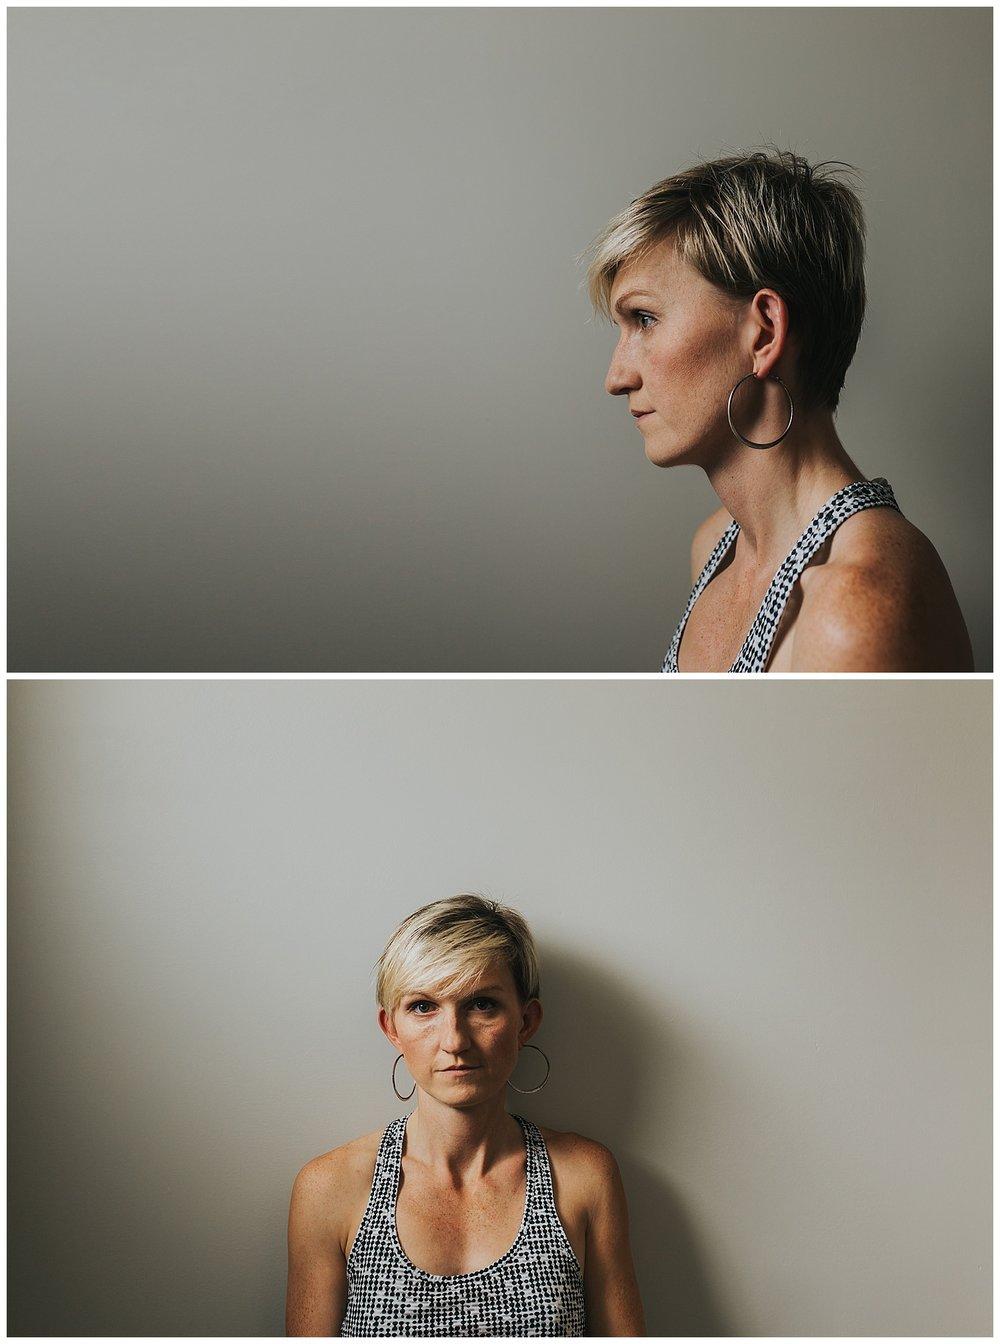 portraits 3.jpg